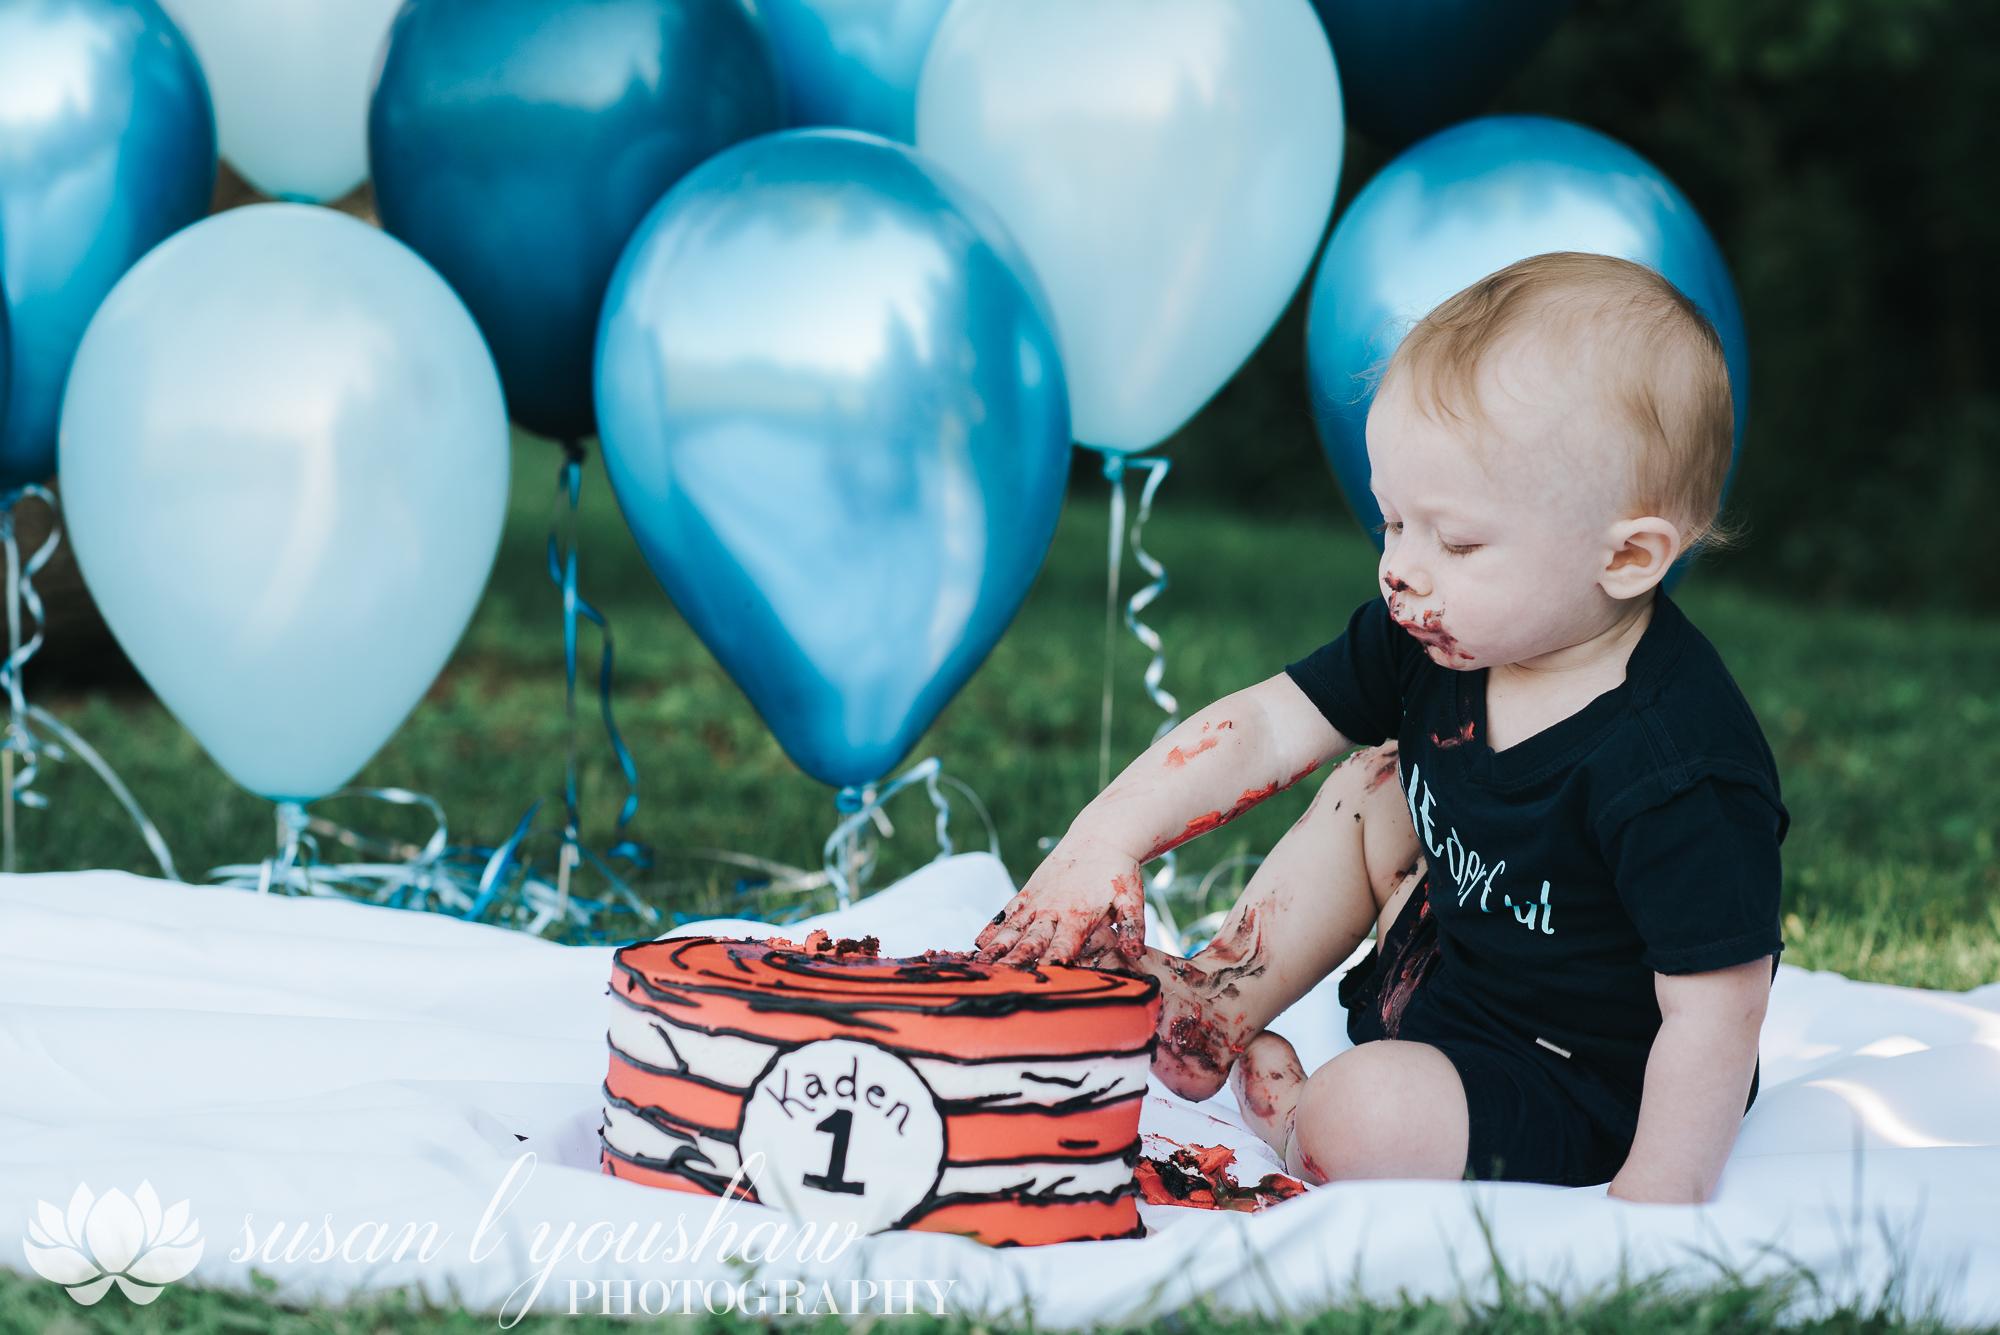 BLOG Kaden's First Birthday 07-18-2018 SLY Photography LLC-10.jpg